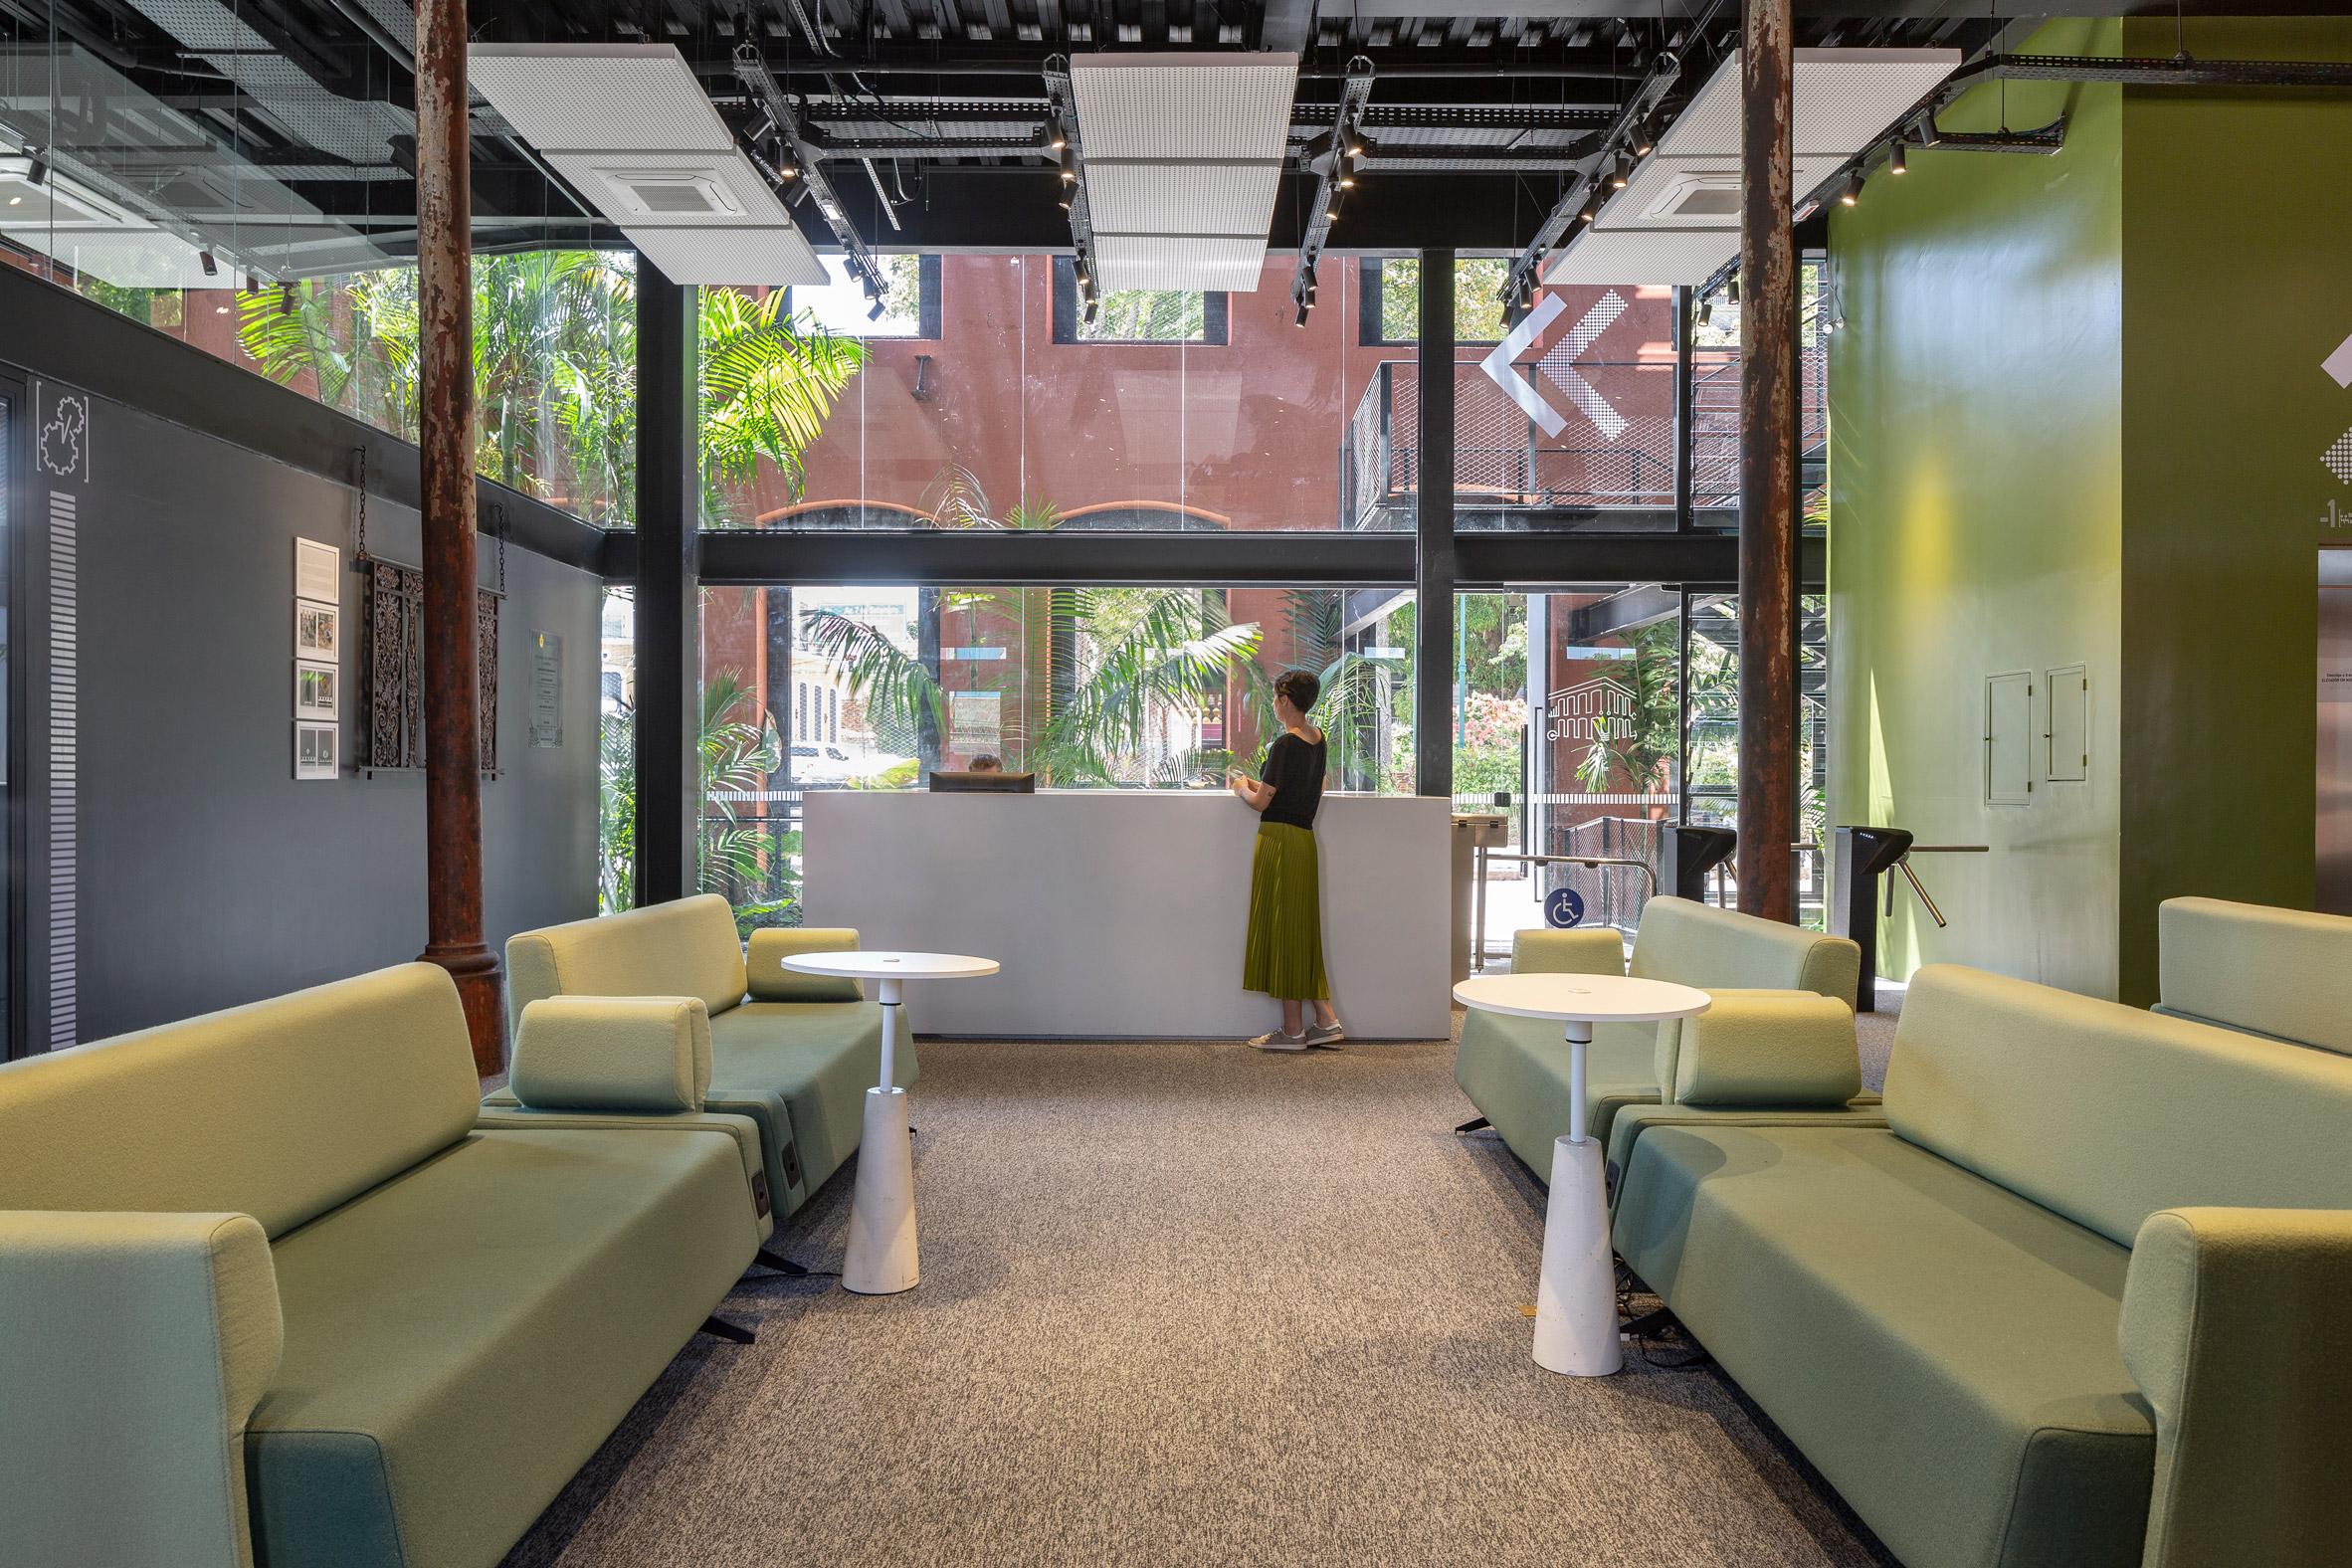 Interiors of Cassina Innovation House